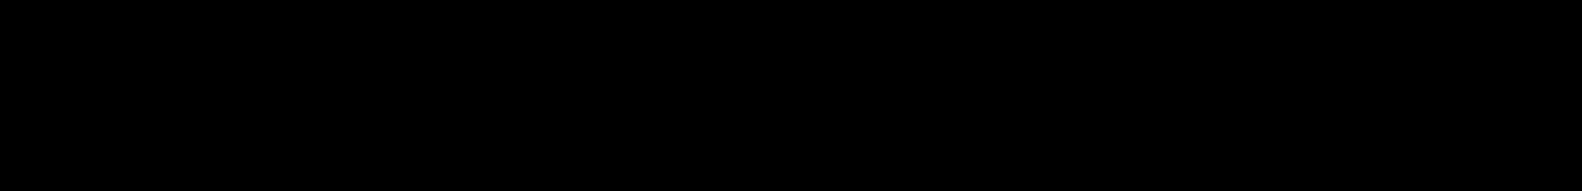 Andes Italic Black